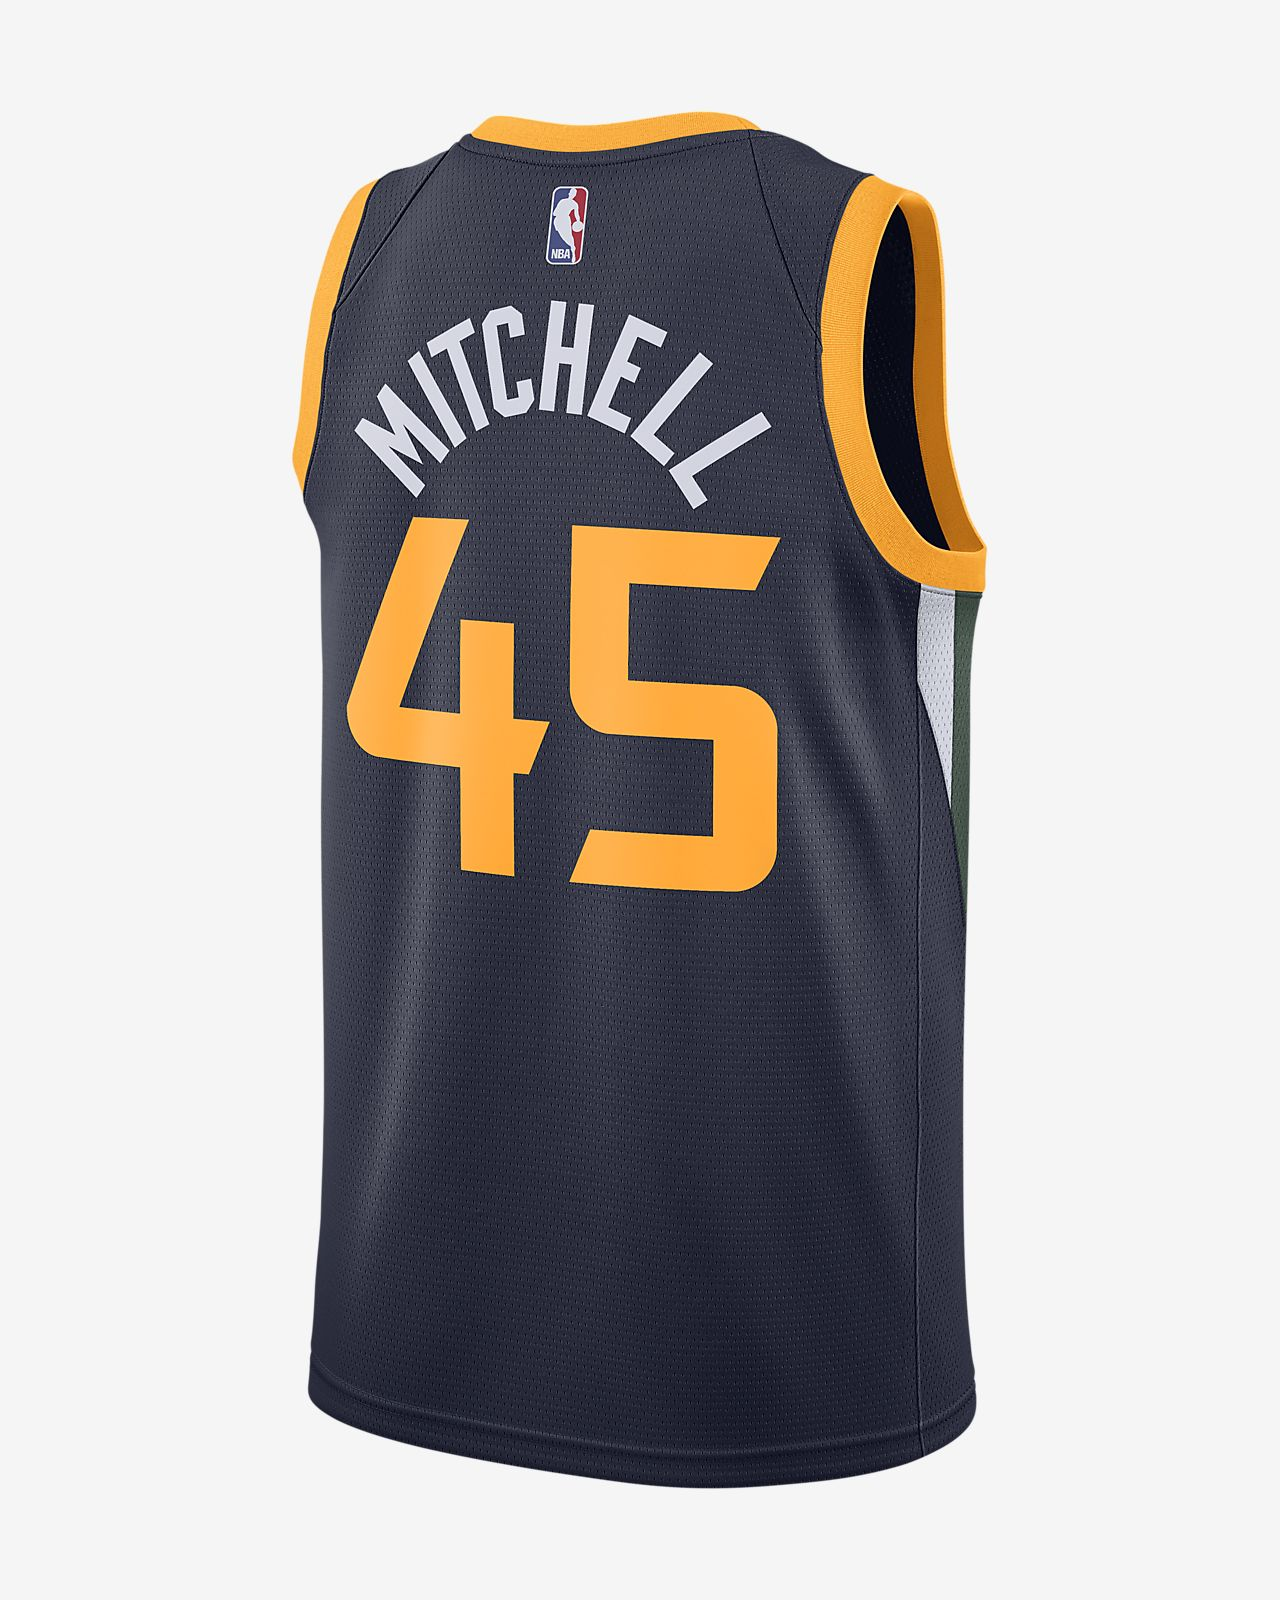 7f5187ca2 ... Donovan Mitchell Icon Edition Swingman (Utah Jazz) Men s Nike NBA  Connected Jersey